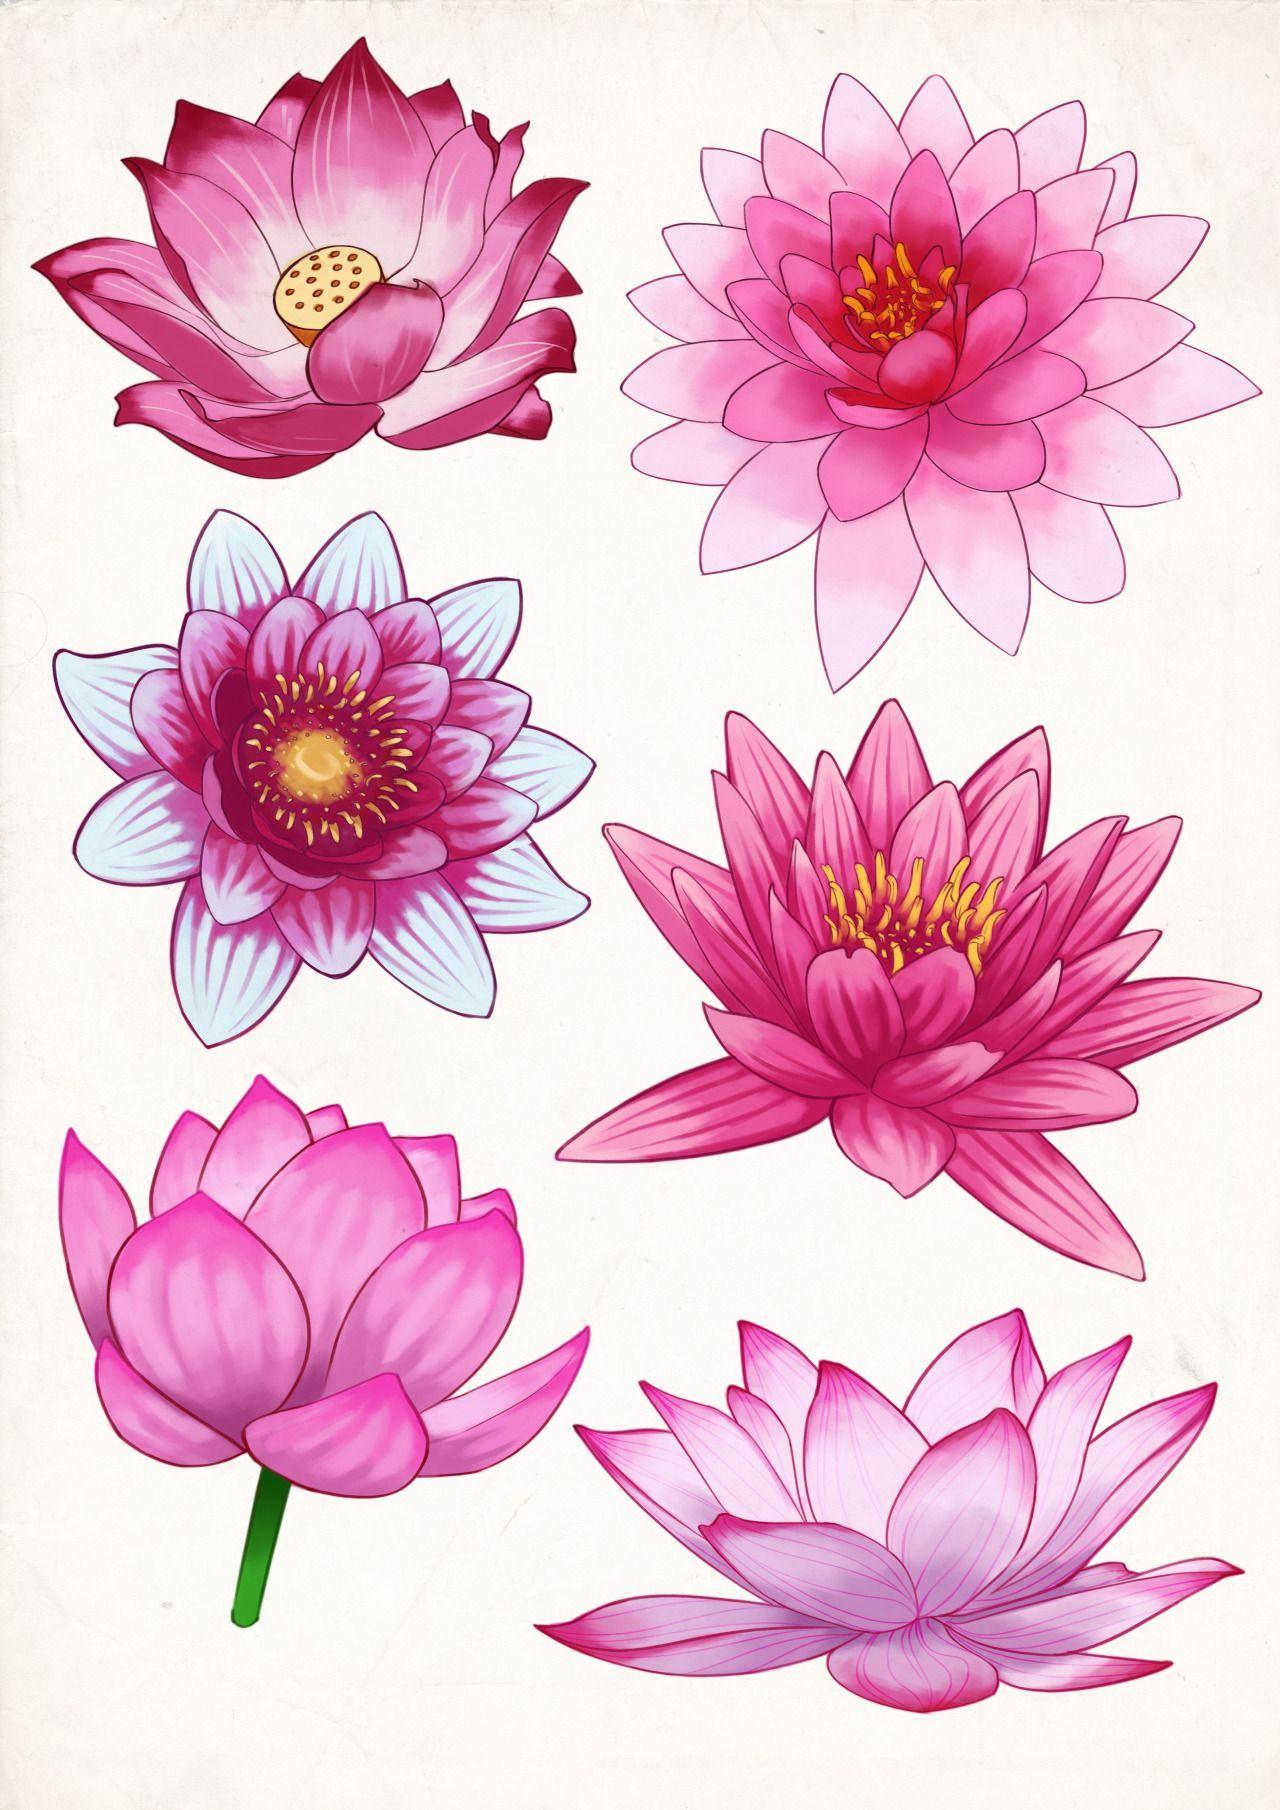 Realistic Lotus Drawing : realistic, lotus, drawing, Création, FelineTrickster, Lotus, Flower, Drawing,, Mandala